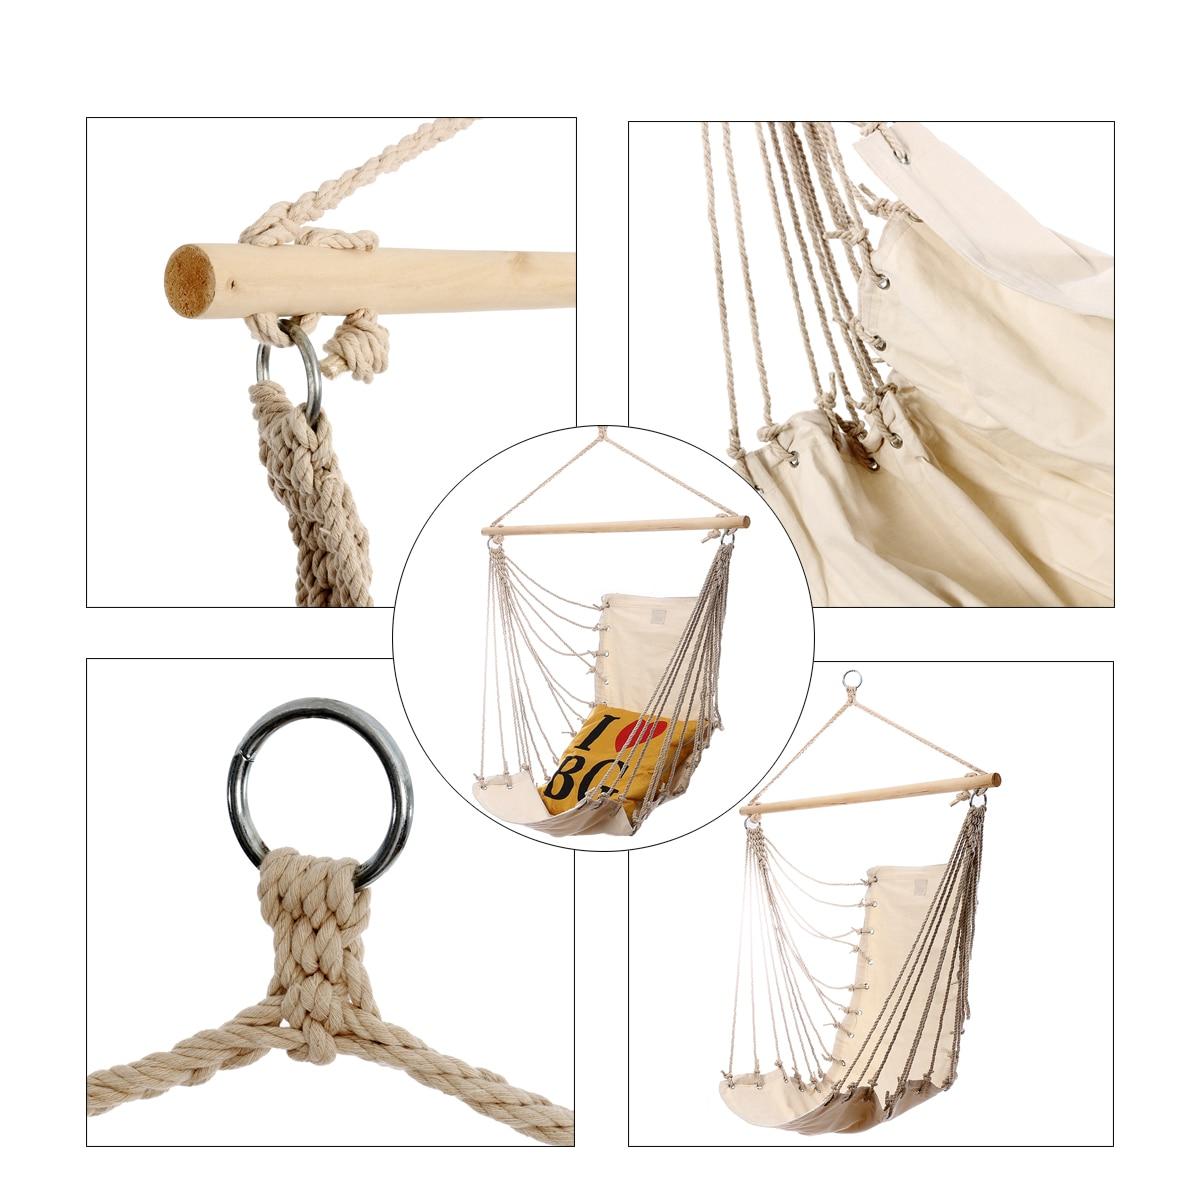 Transportable Backyard Hanging Cotton Hammock Chair Tenting Single Swing Seat Stress-free Furnishings For Baby Grownup Swinging Security Chair HTB1MUmNyHGYBuNjy0Foq6AiBFXaK